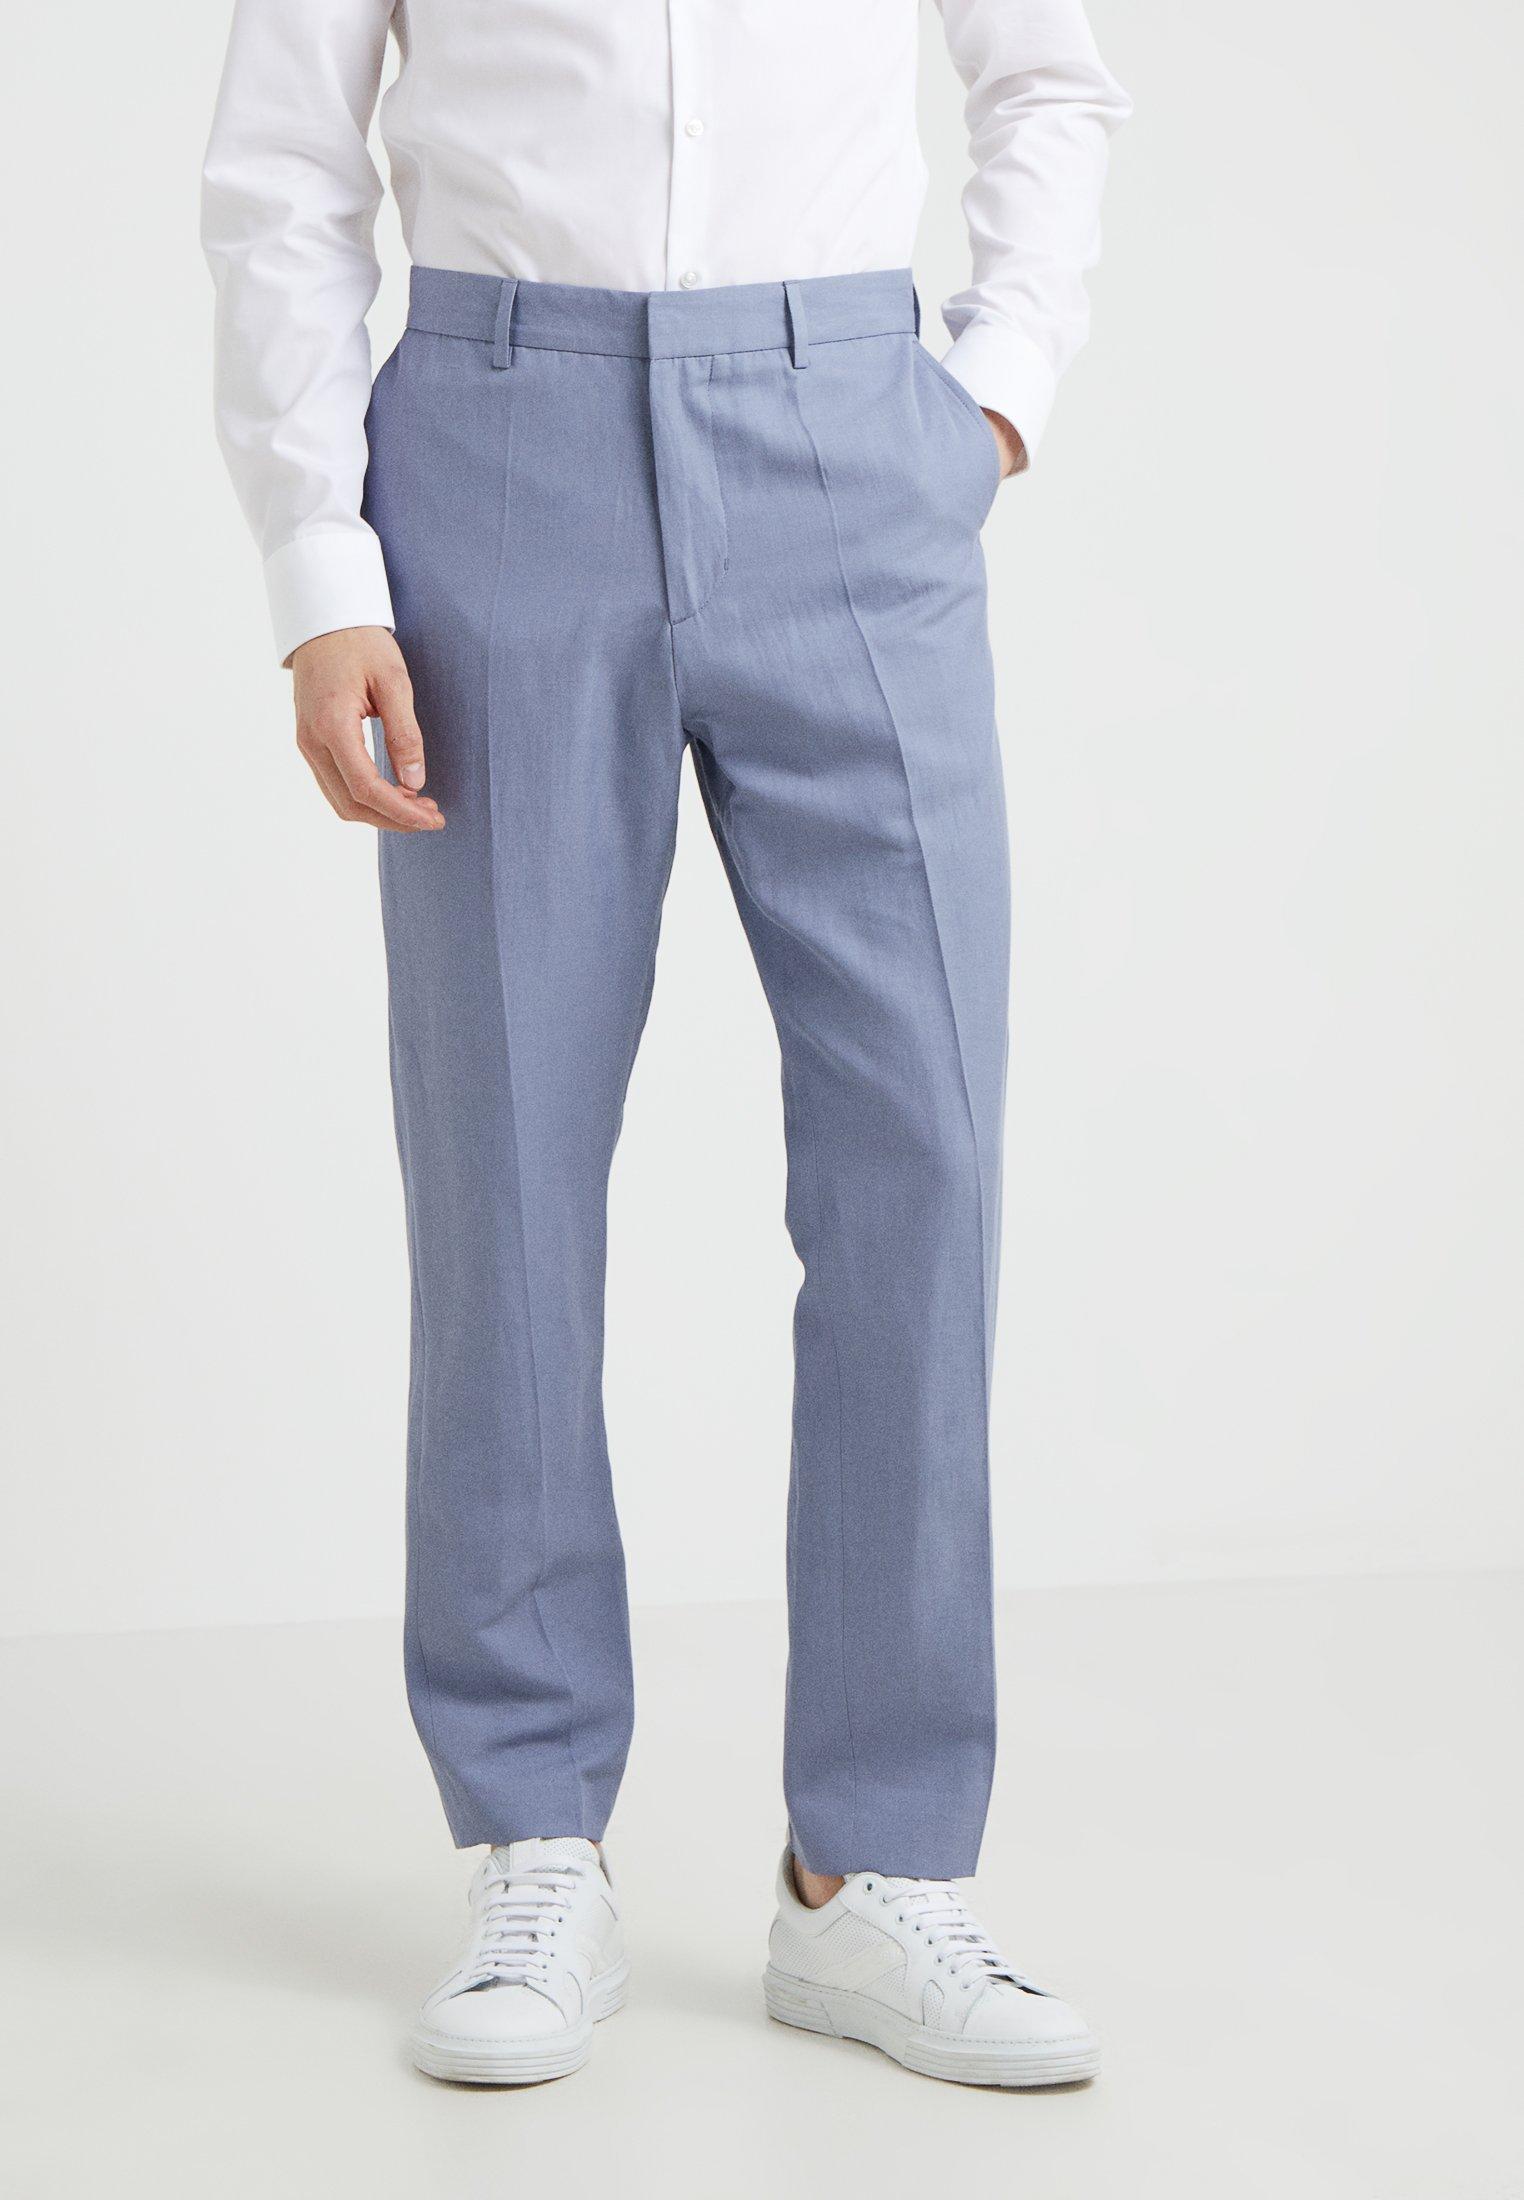 K Bluestone TrouserPantalon Justin Drapey Filippa Classique nk0OP8wX